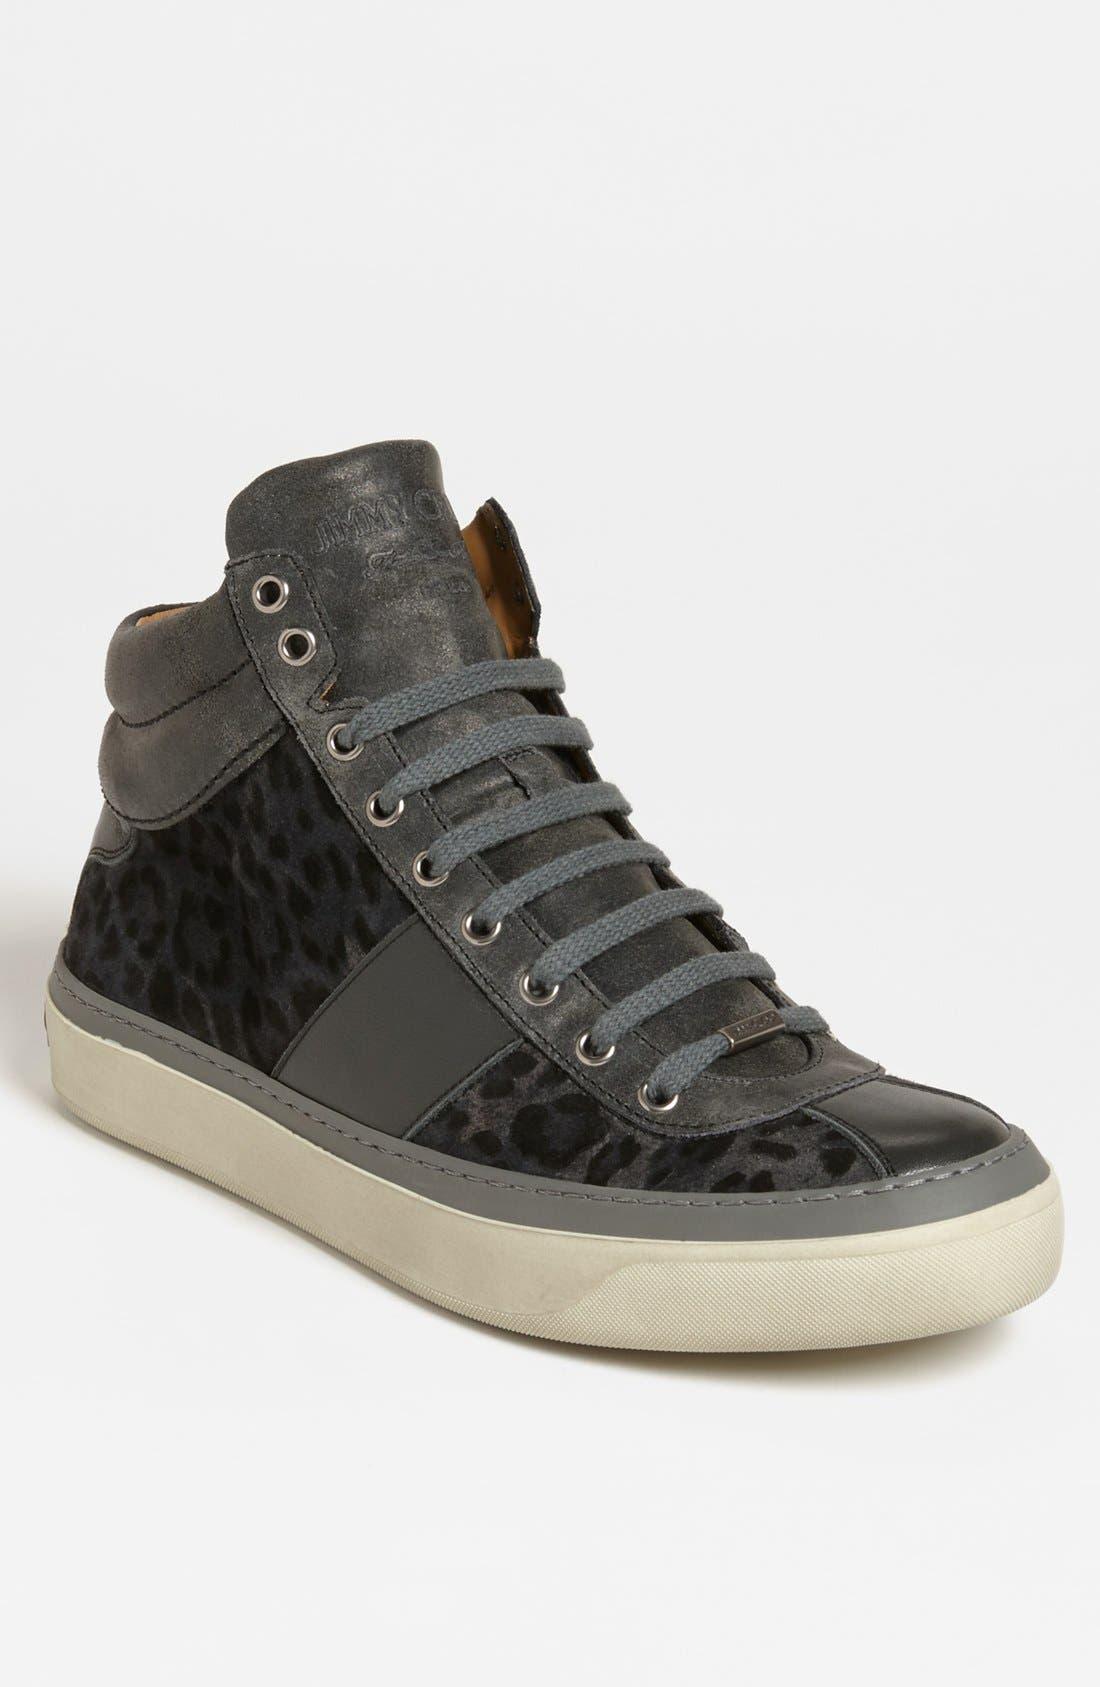 Alternate Image 1 Selected - Jimmy Choo 'Belgravi' Sneaker